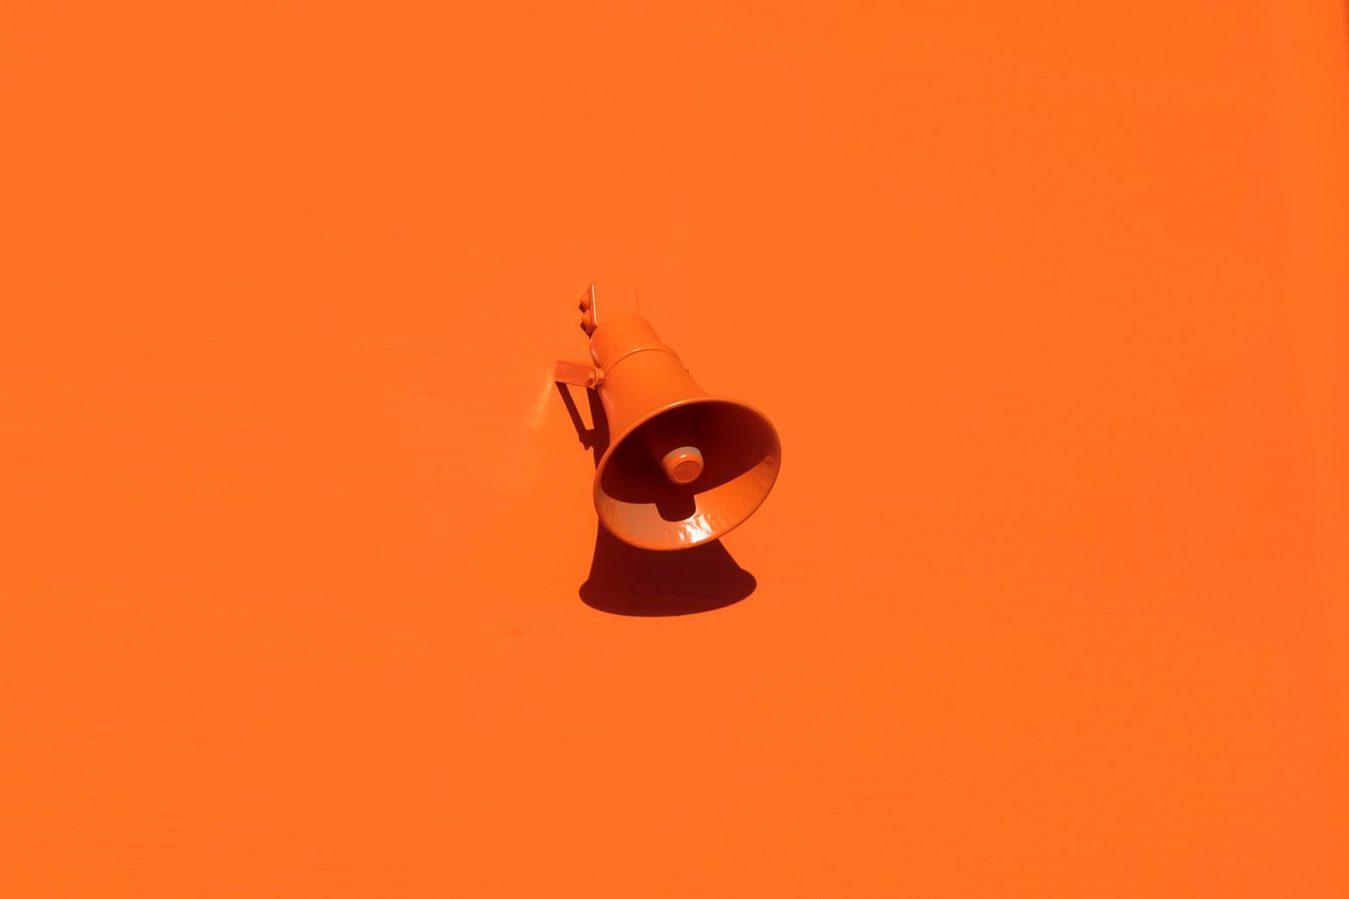 loa trên nền màu cam